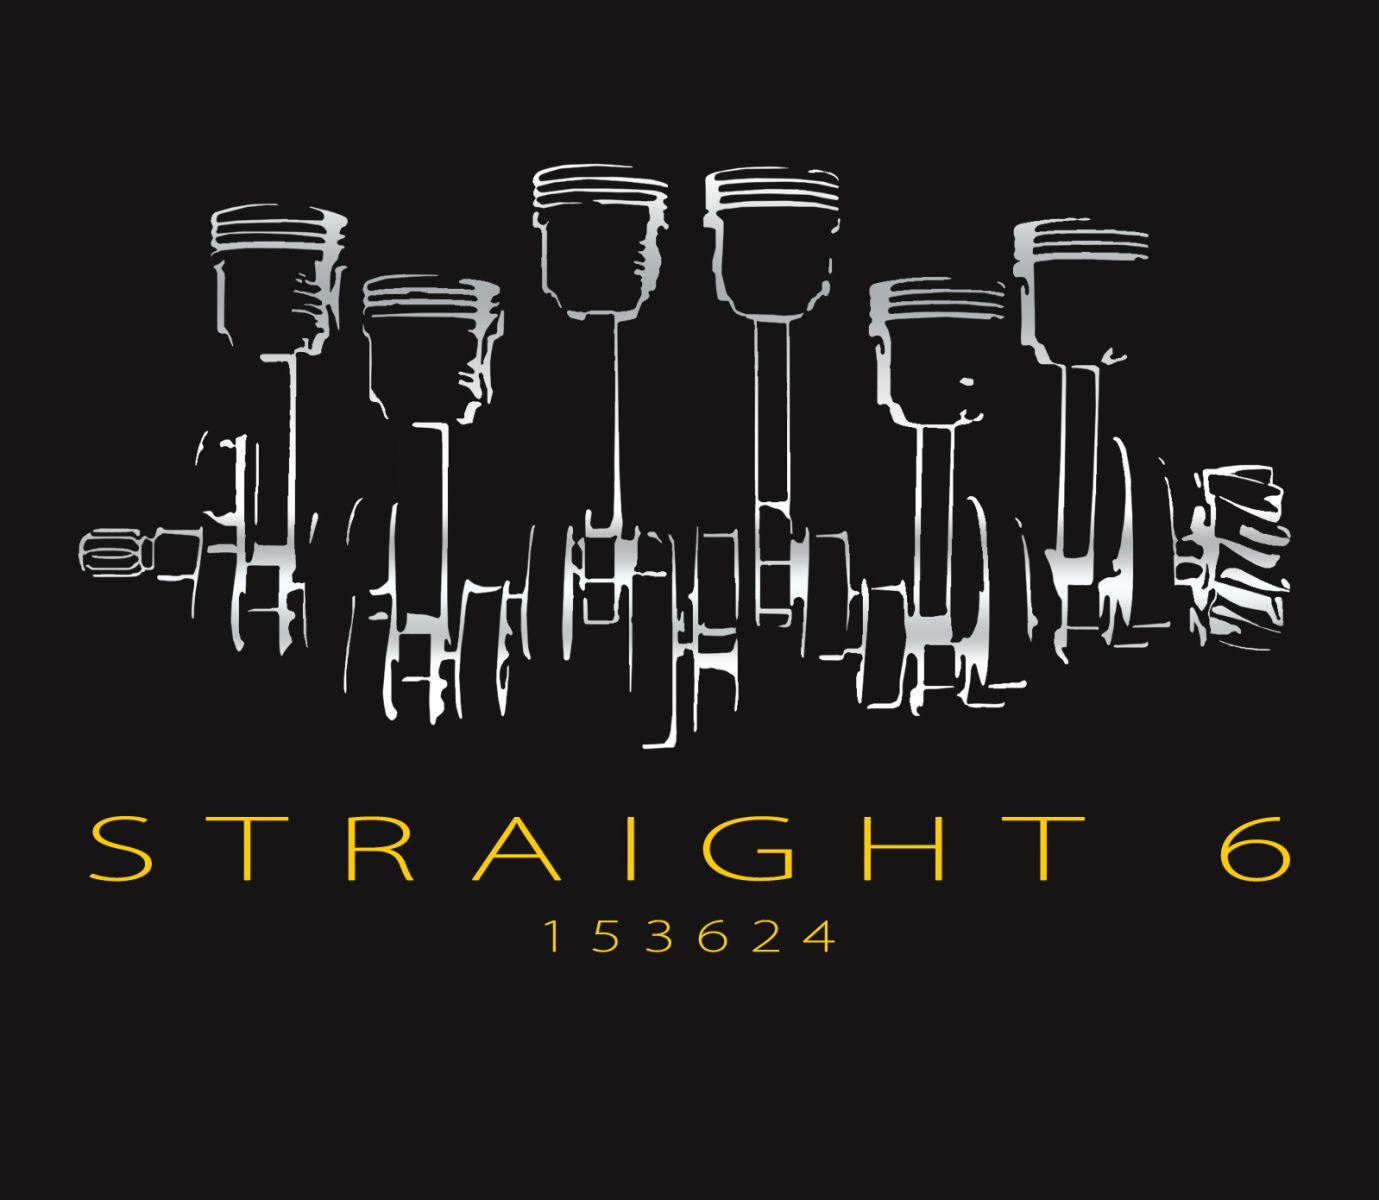 straight six engine t shirt pistons supra e92 e46 e30 e21